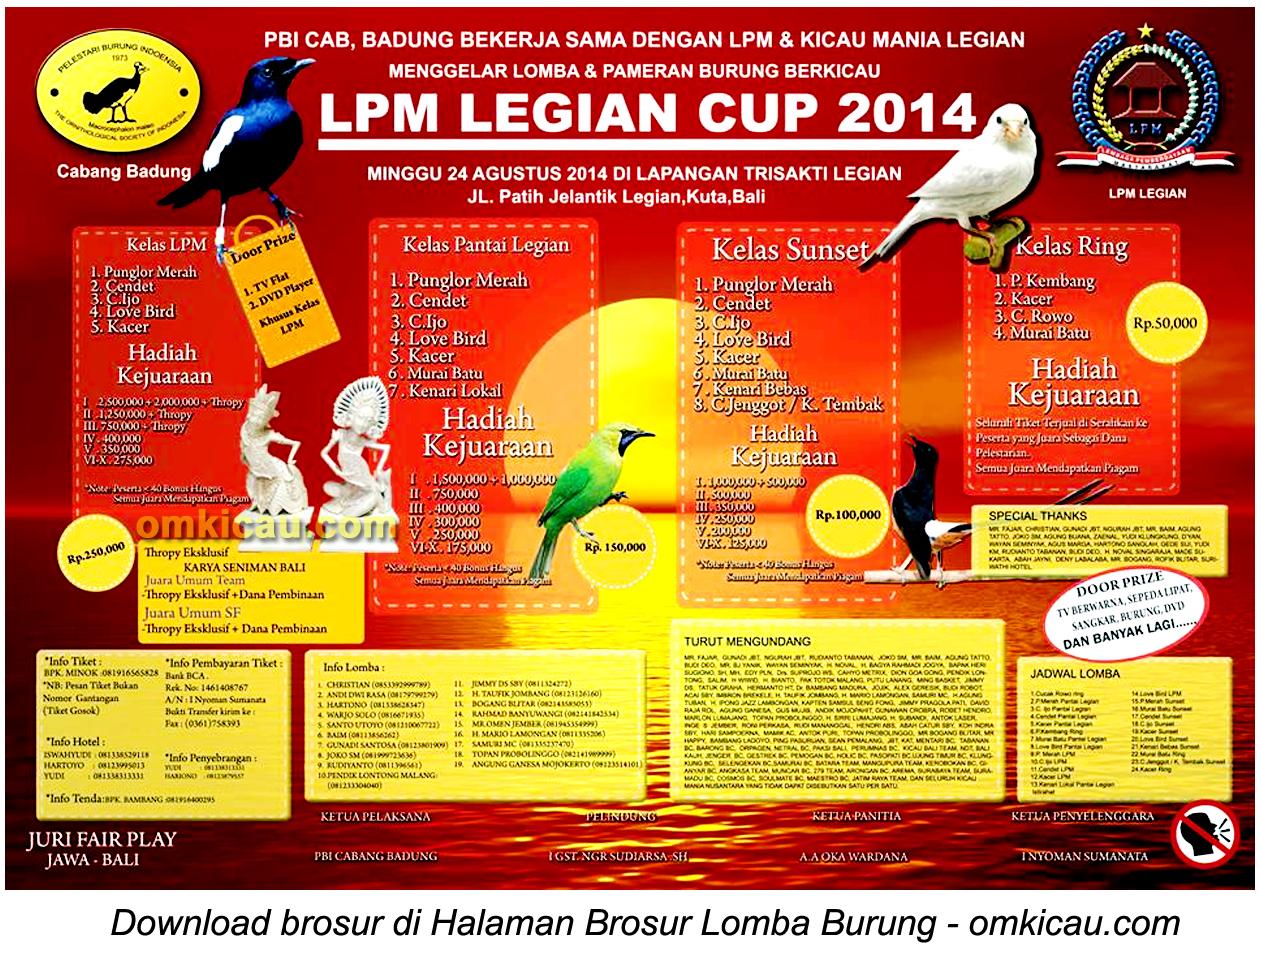 Brosur Lomba Burung Berkicau LPM Legian Cup, Kuta, 24 Agustus 2014